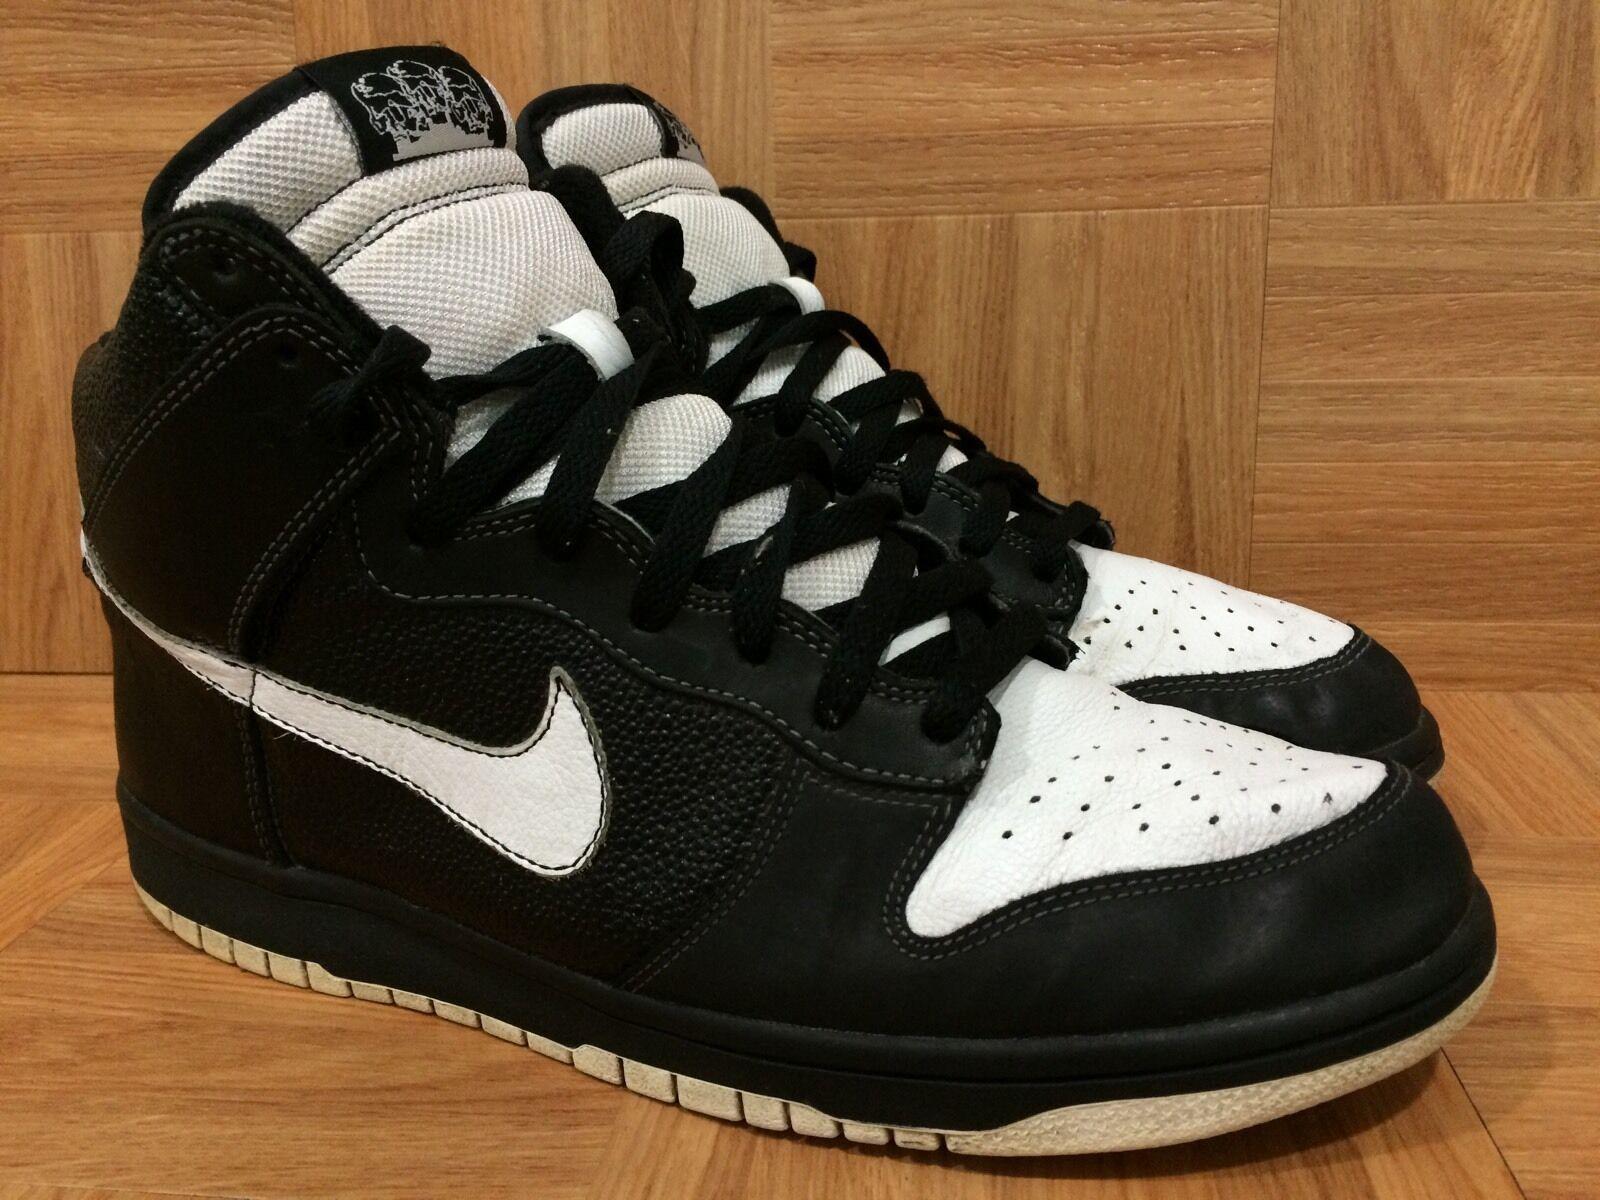 RARE   Nike Dunk Hi Premium Nort Recon Black White Sz 11 314263-012 OG SOLES